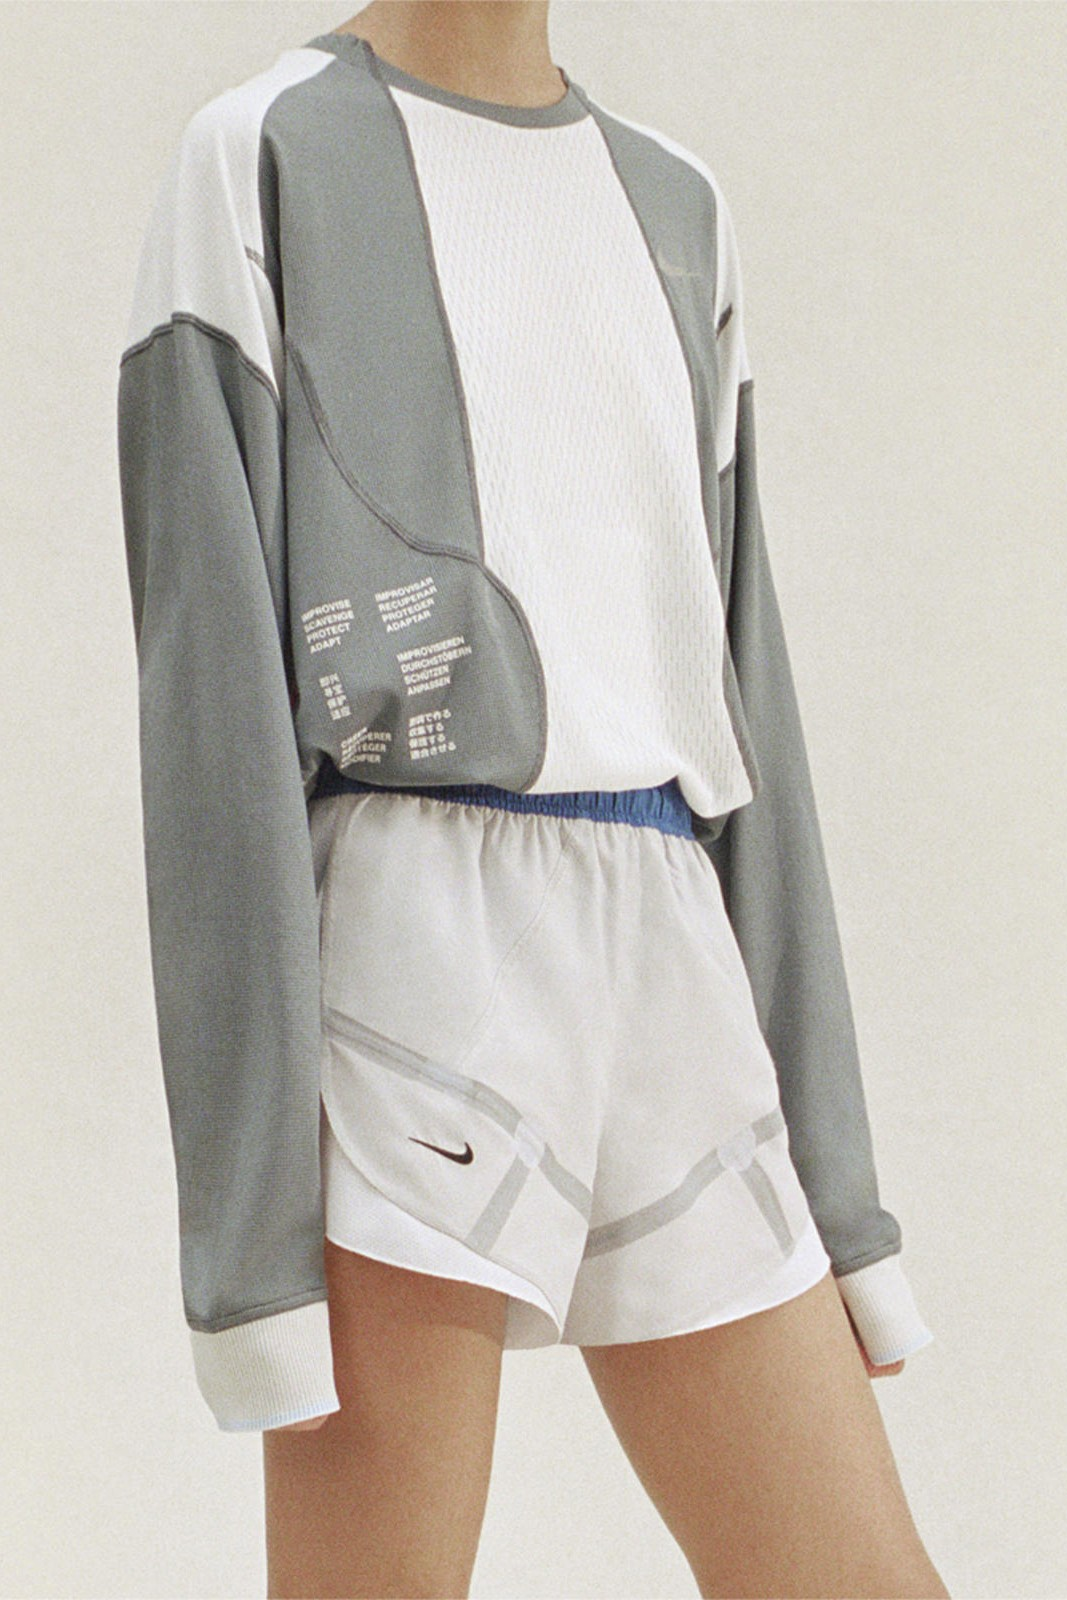 nike-ispa-clothes-dtf-magazine-22